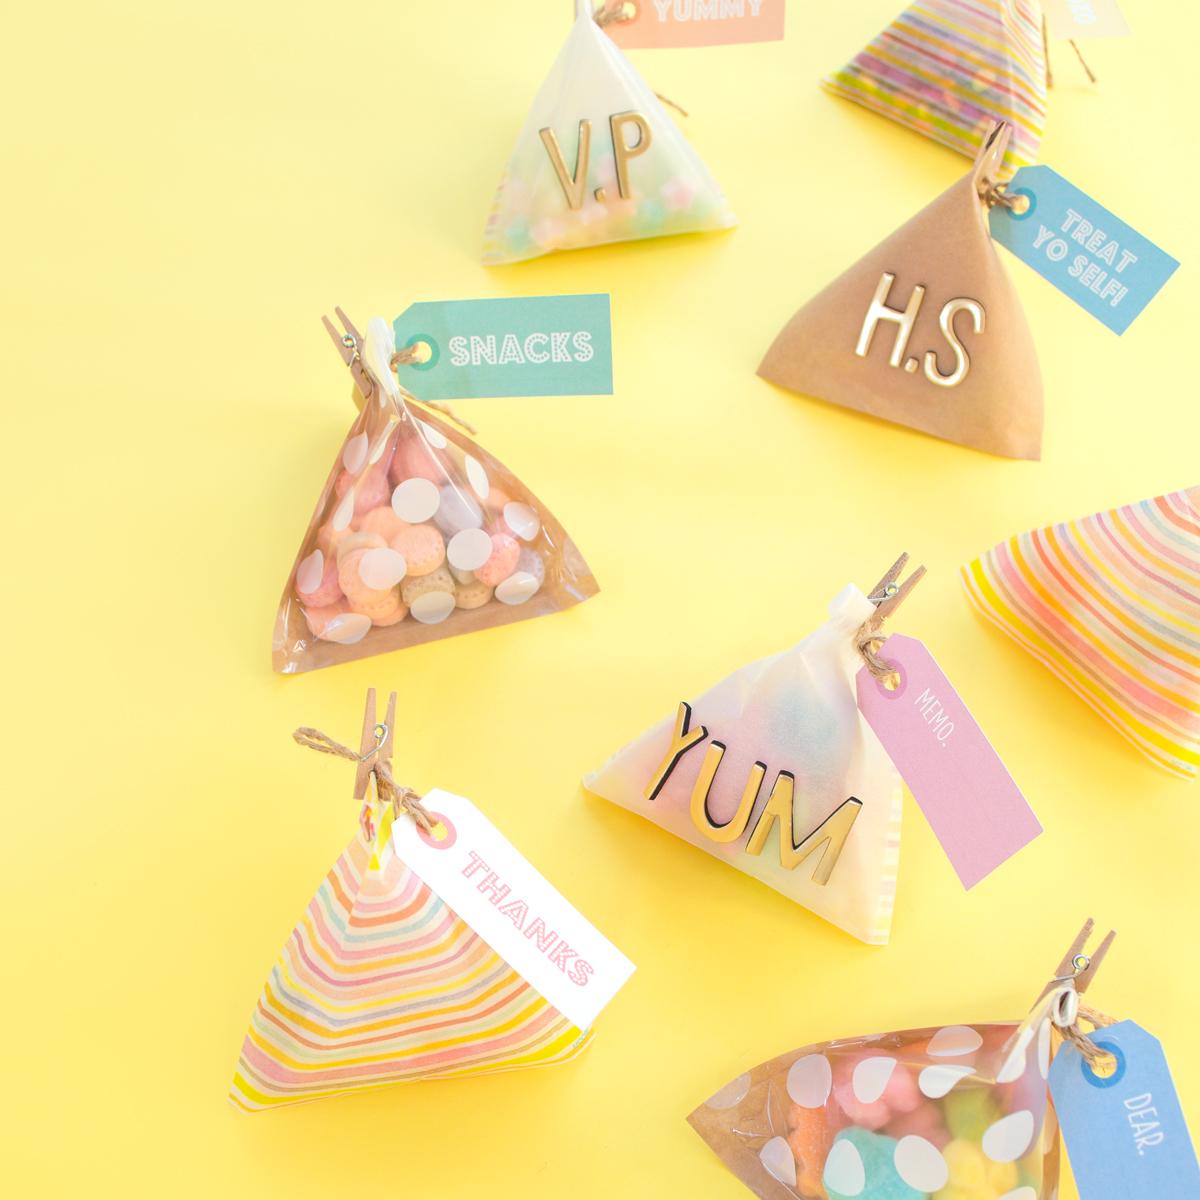 <center>テトラ型ラッピングの折り方&レインボーカラーギフトタグ配布(無料素材) <br><small>Pyramids Gift Wrap & Free TAGS</small></center>